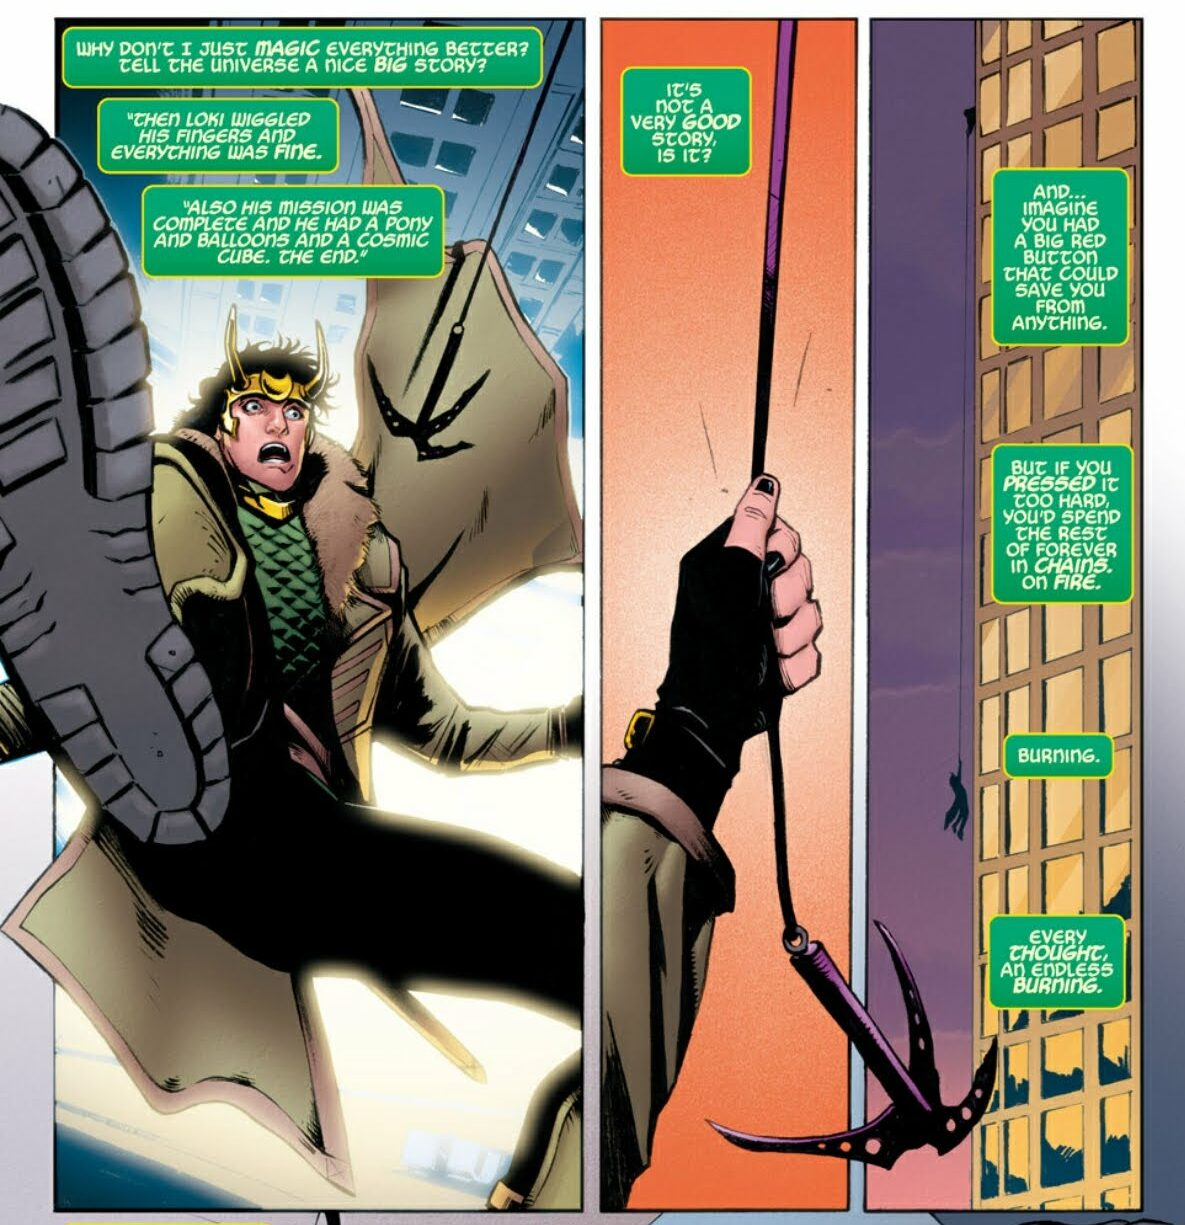 Loki vs Avengers